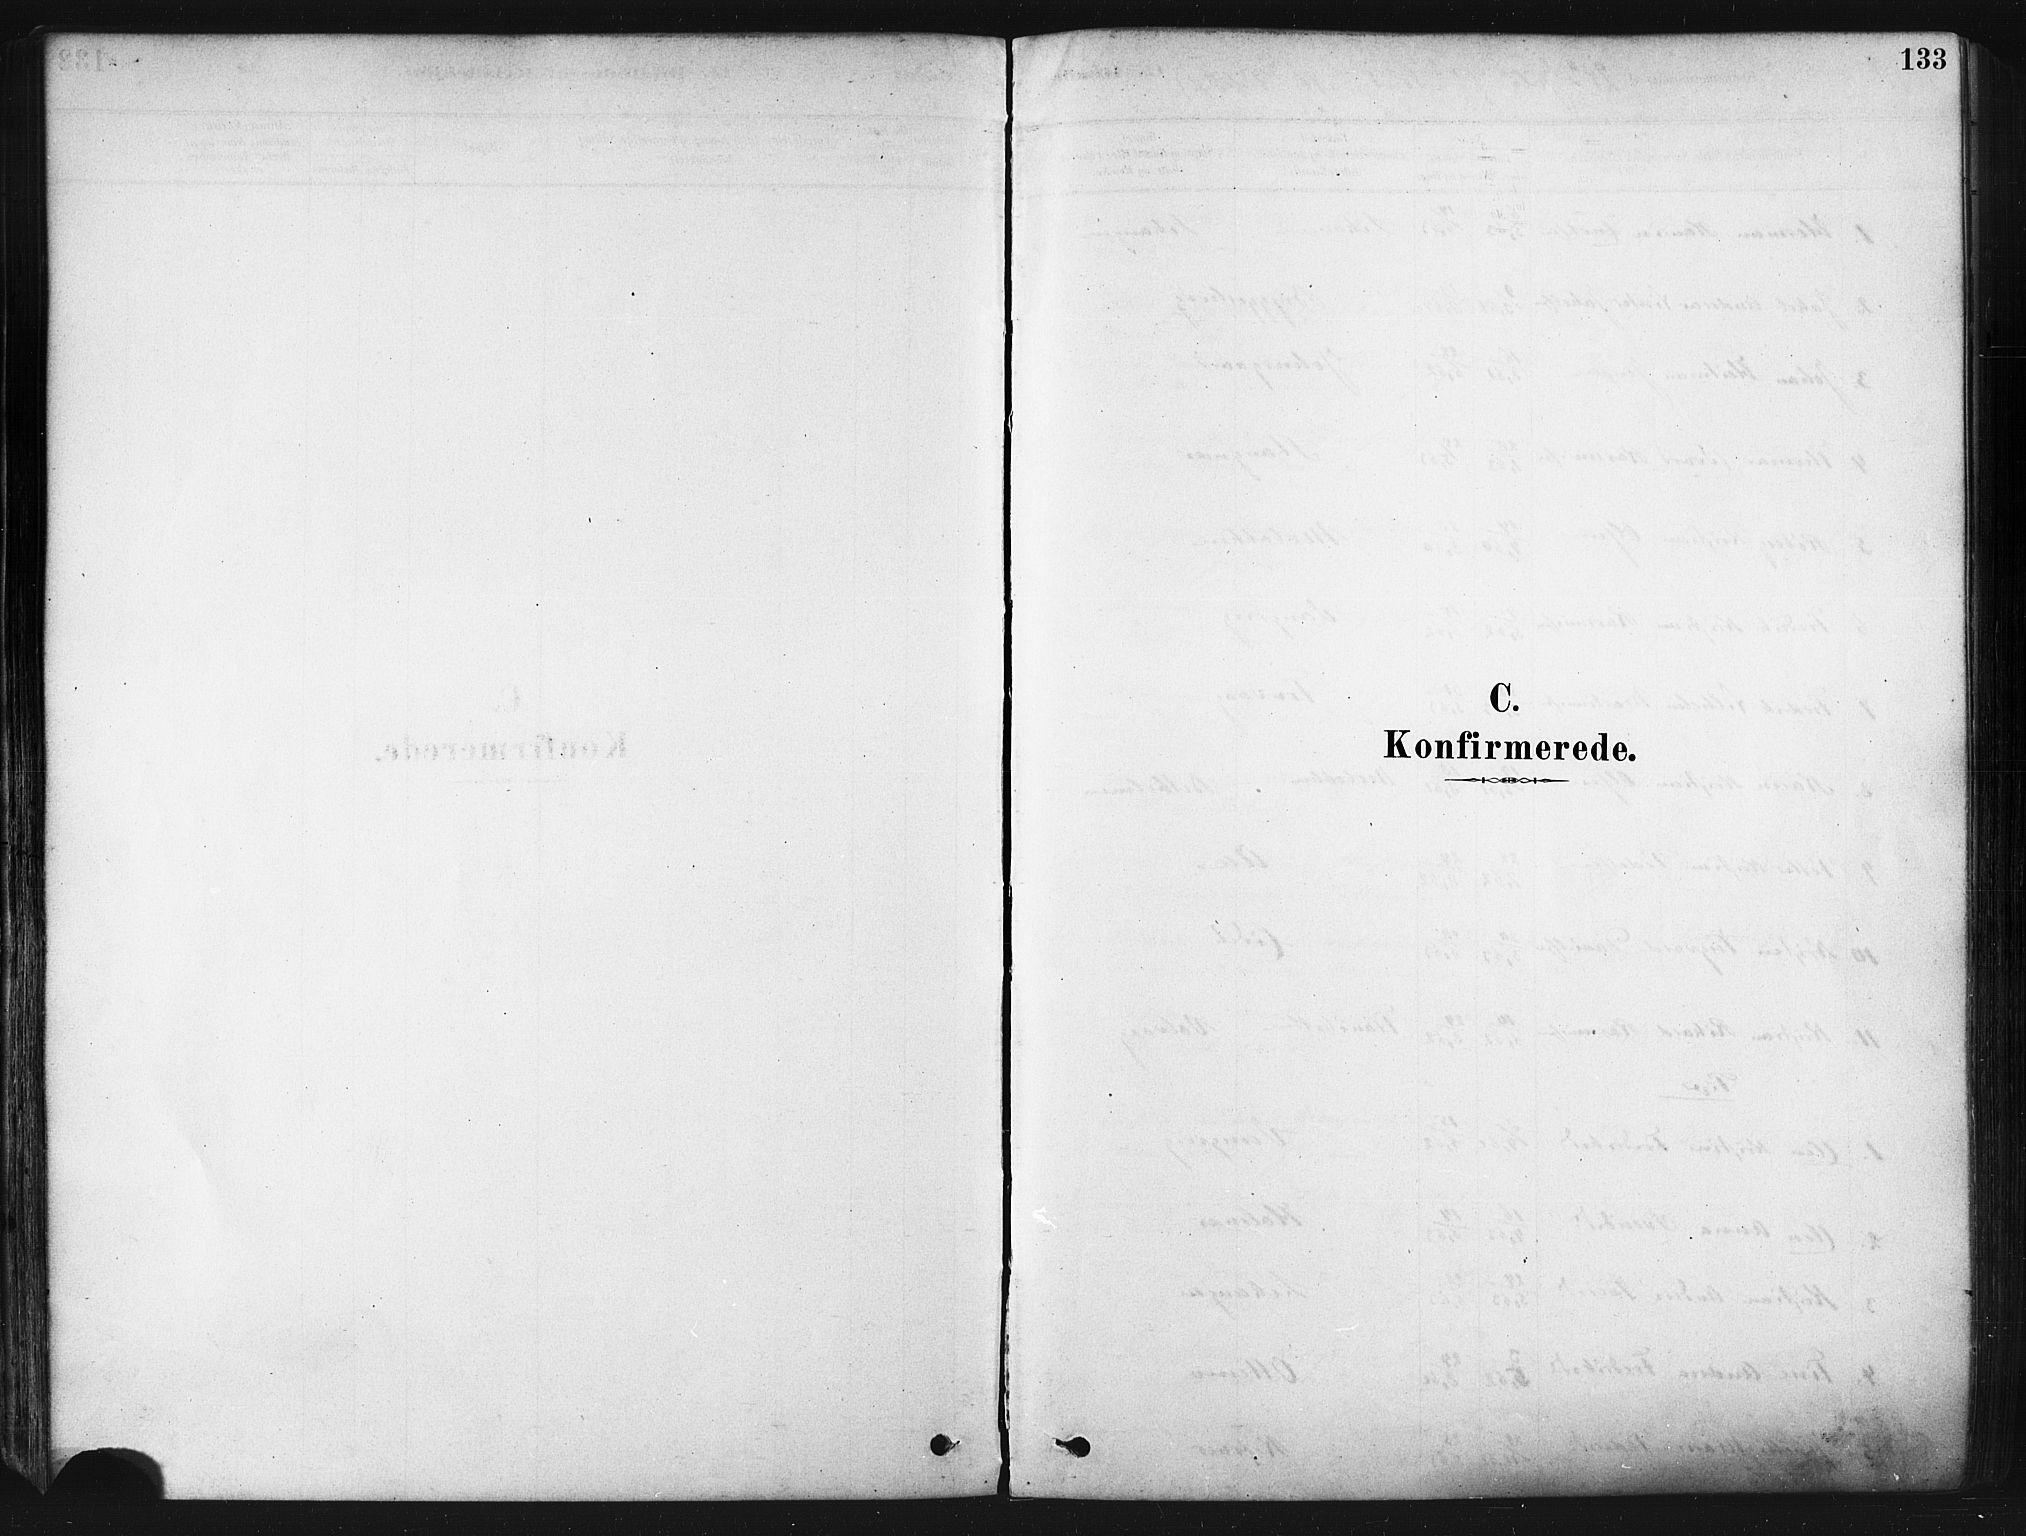 SATØ, Tranøy sokneprestkontor, I/Ia/Iaa/L0009kirke: Ministerialbok nr. 9, 1878-1904, s. 133